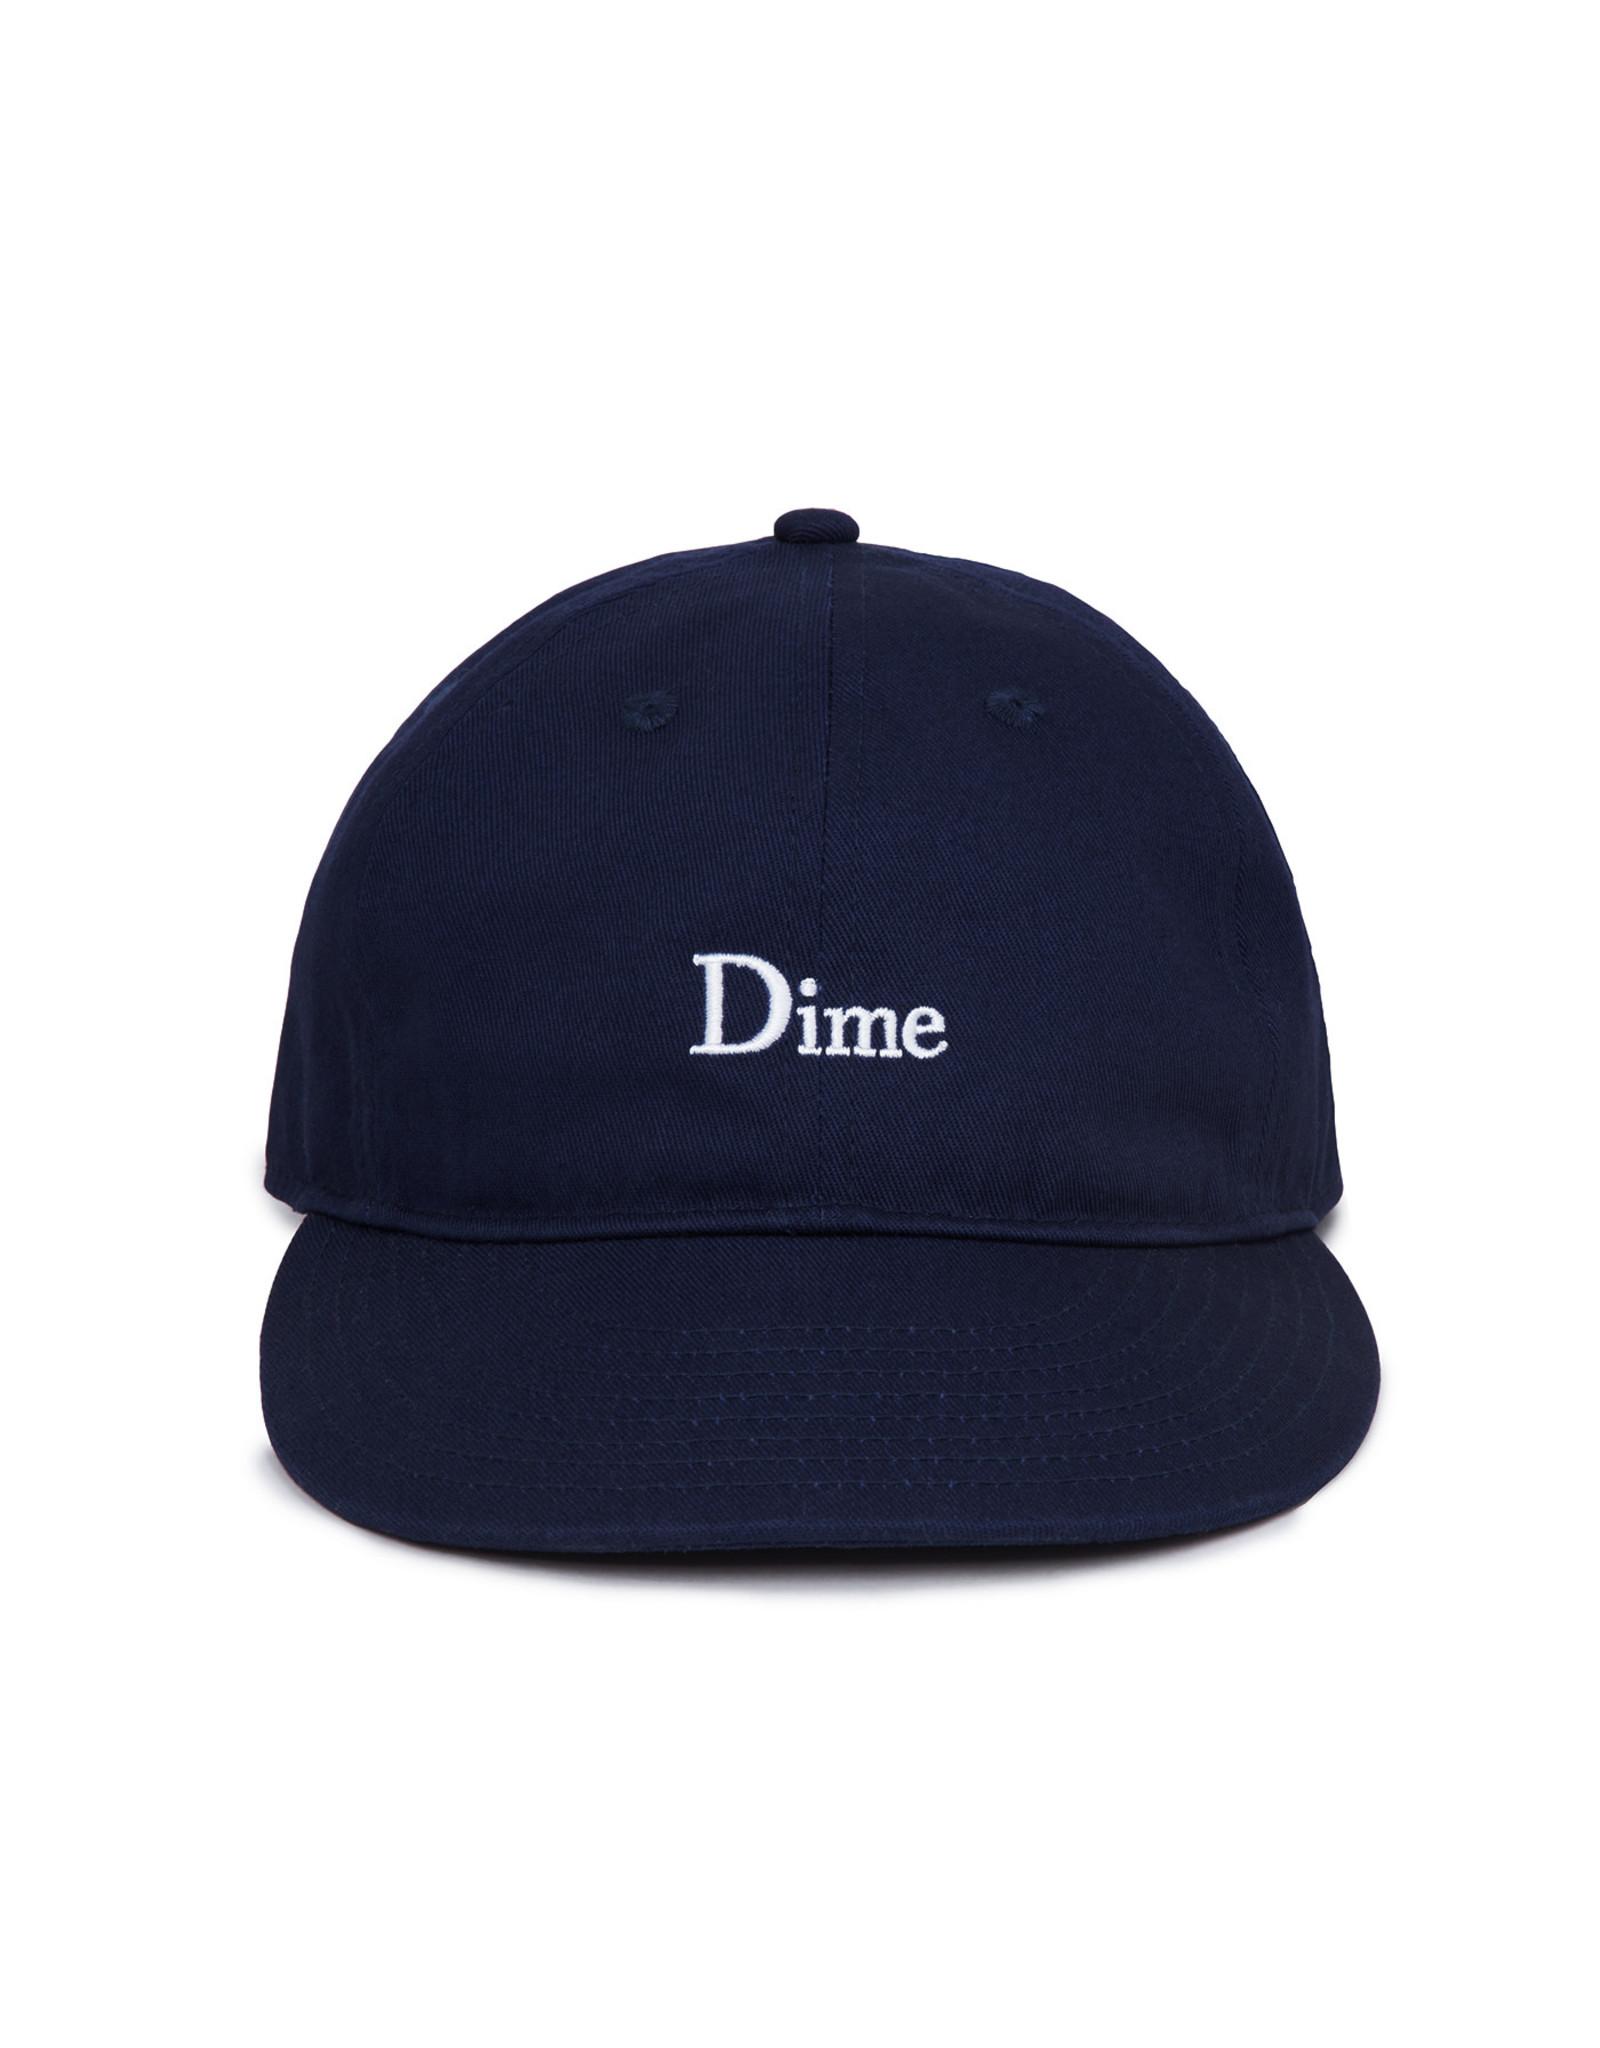 DIME CAP NAVY